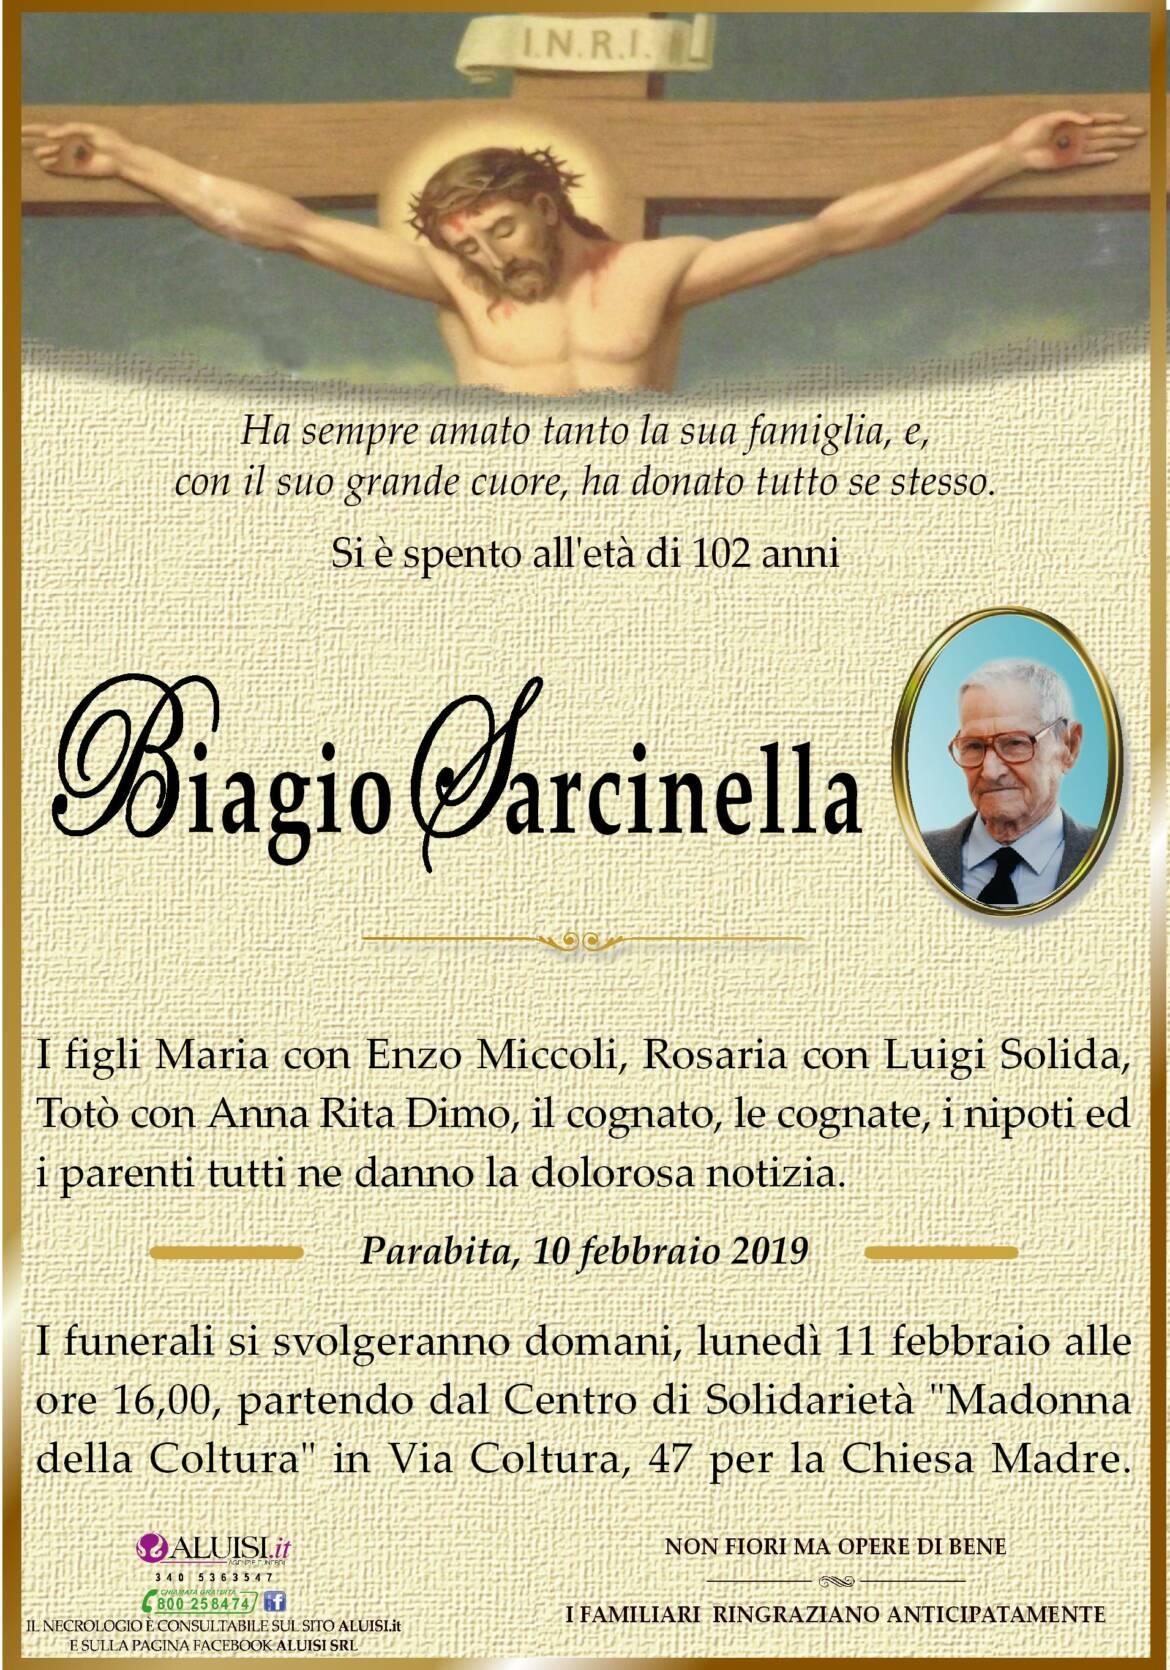 annuncio-biagio-sarcinella-fb.jpg